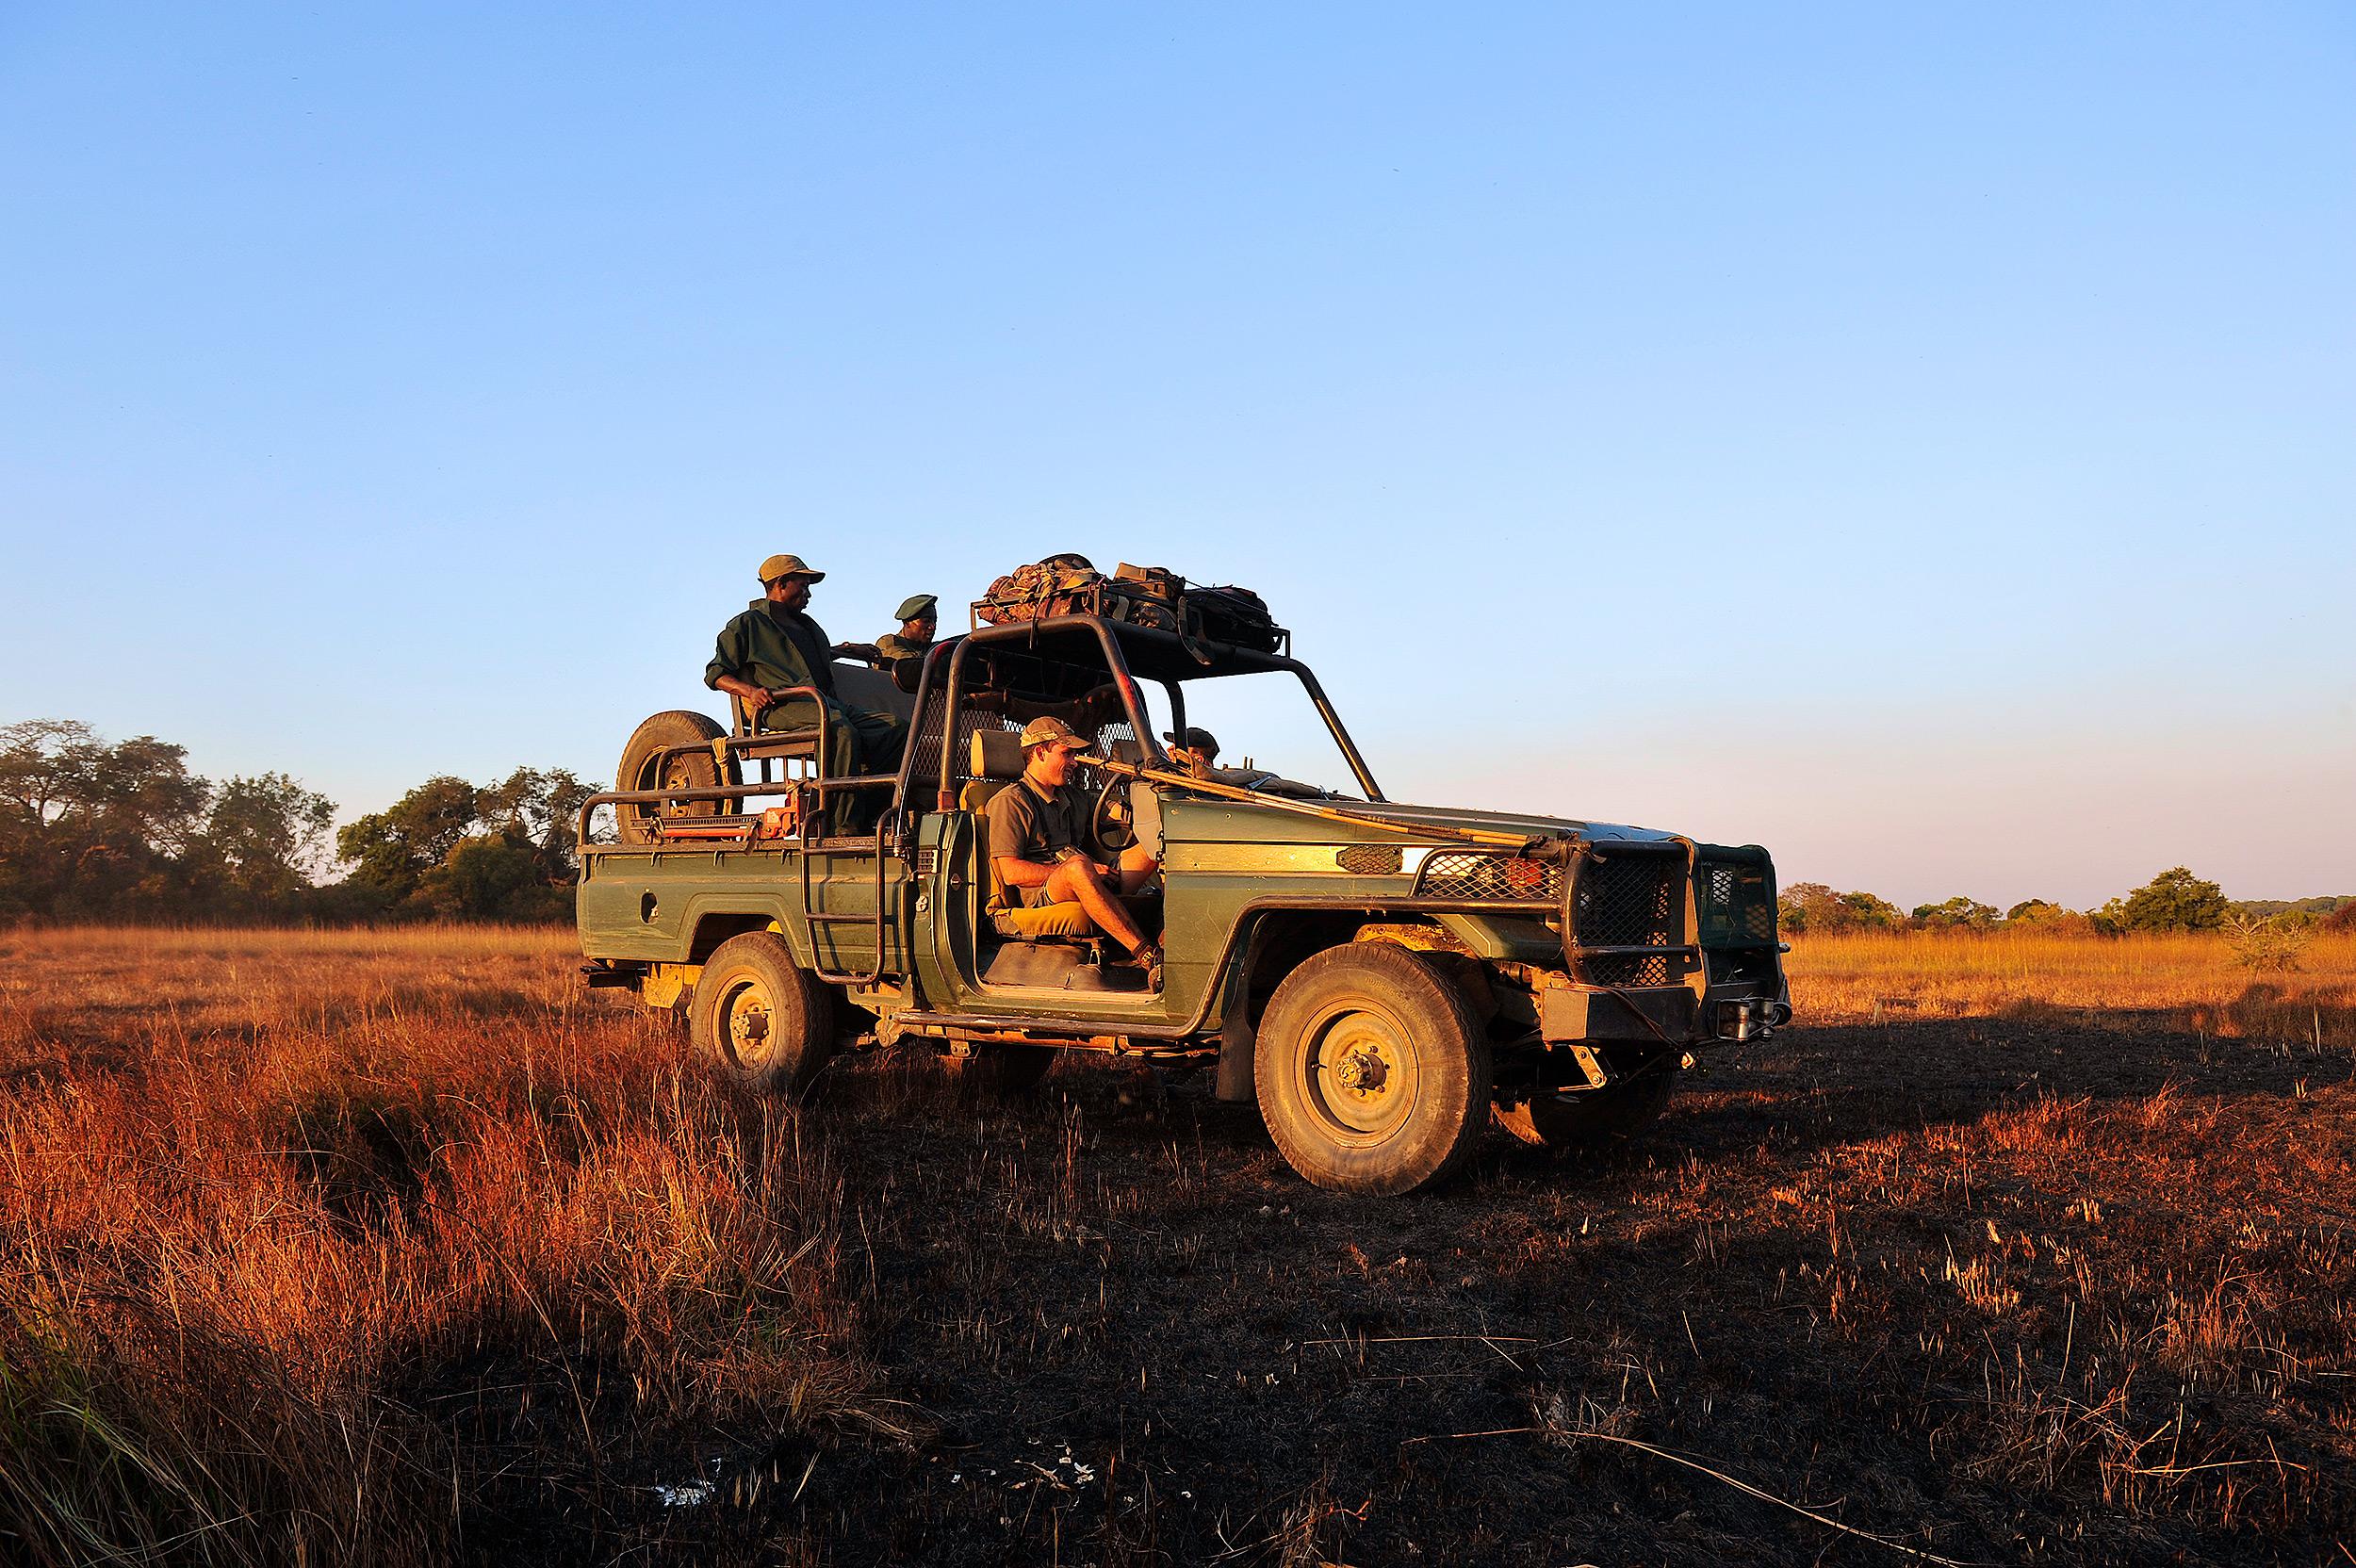 Zambia_09_080.jpg